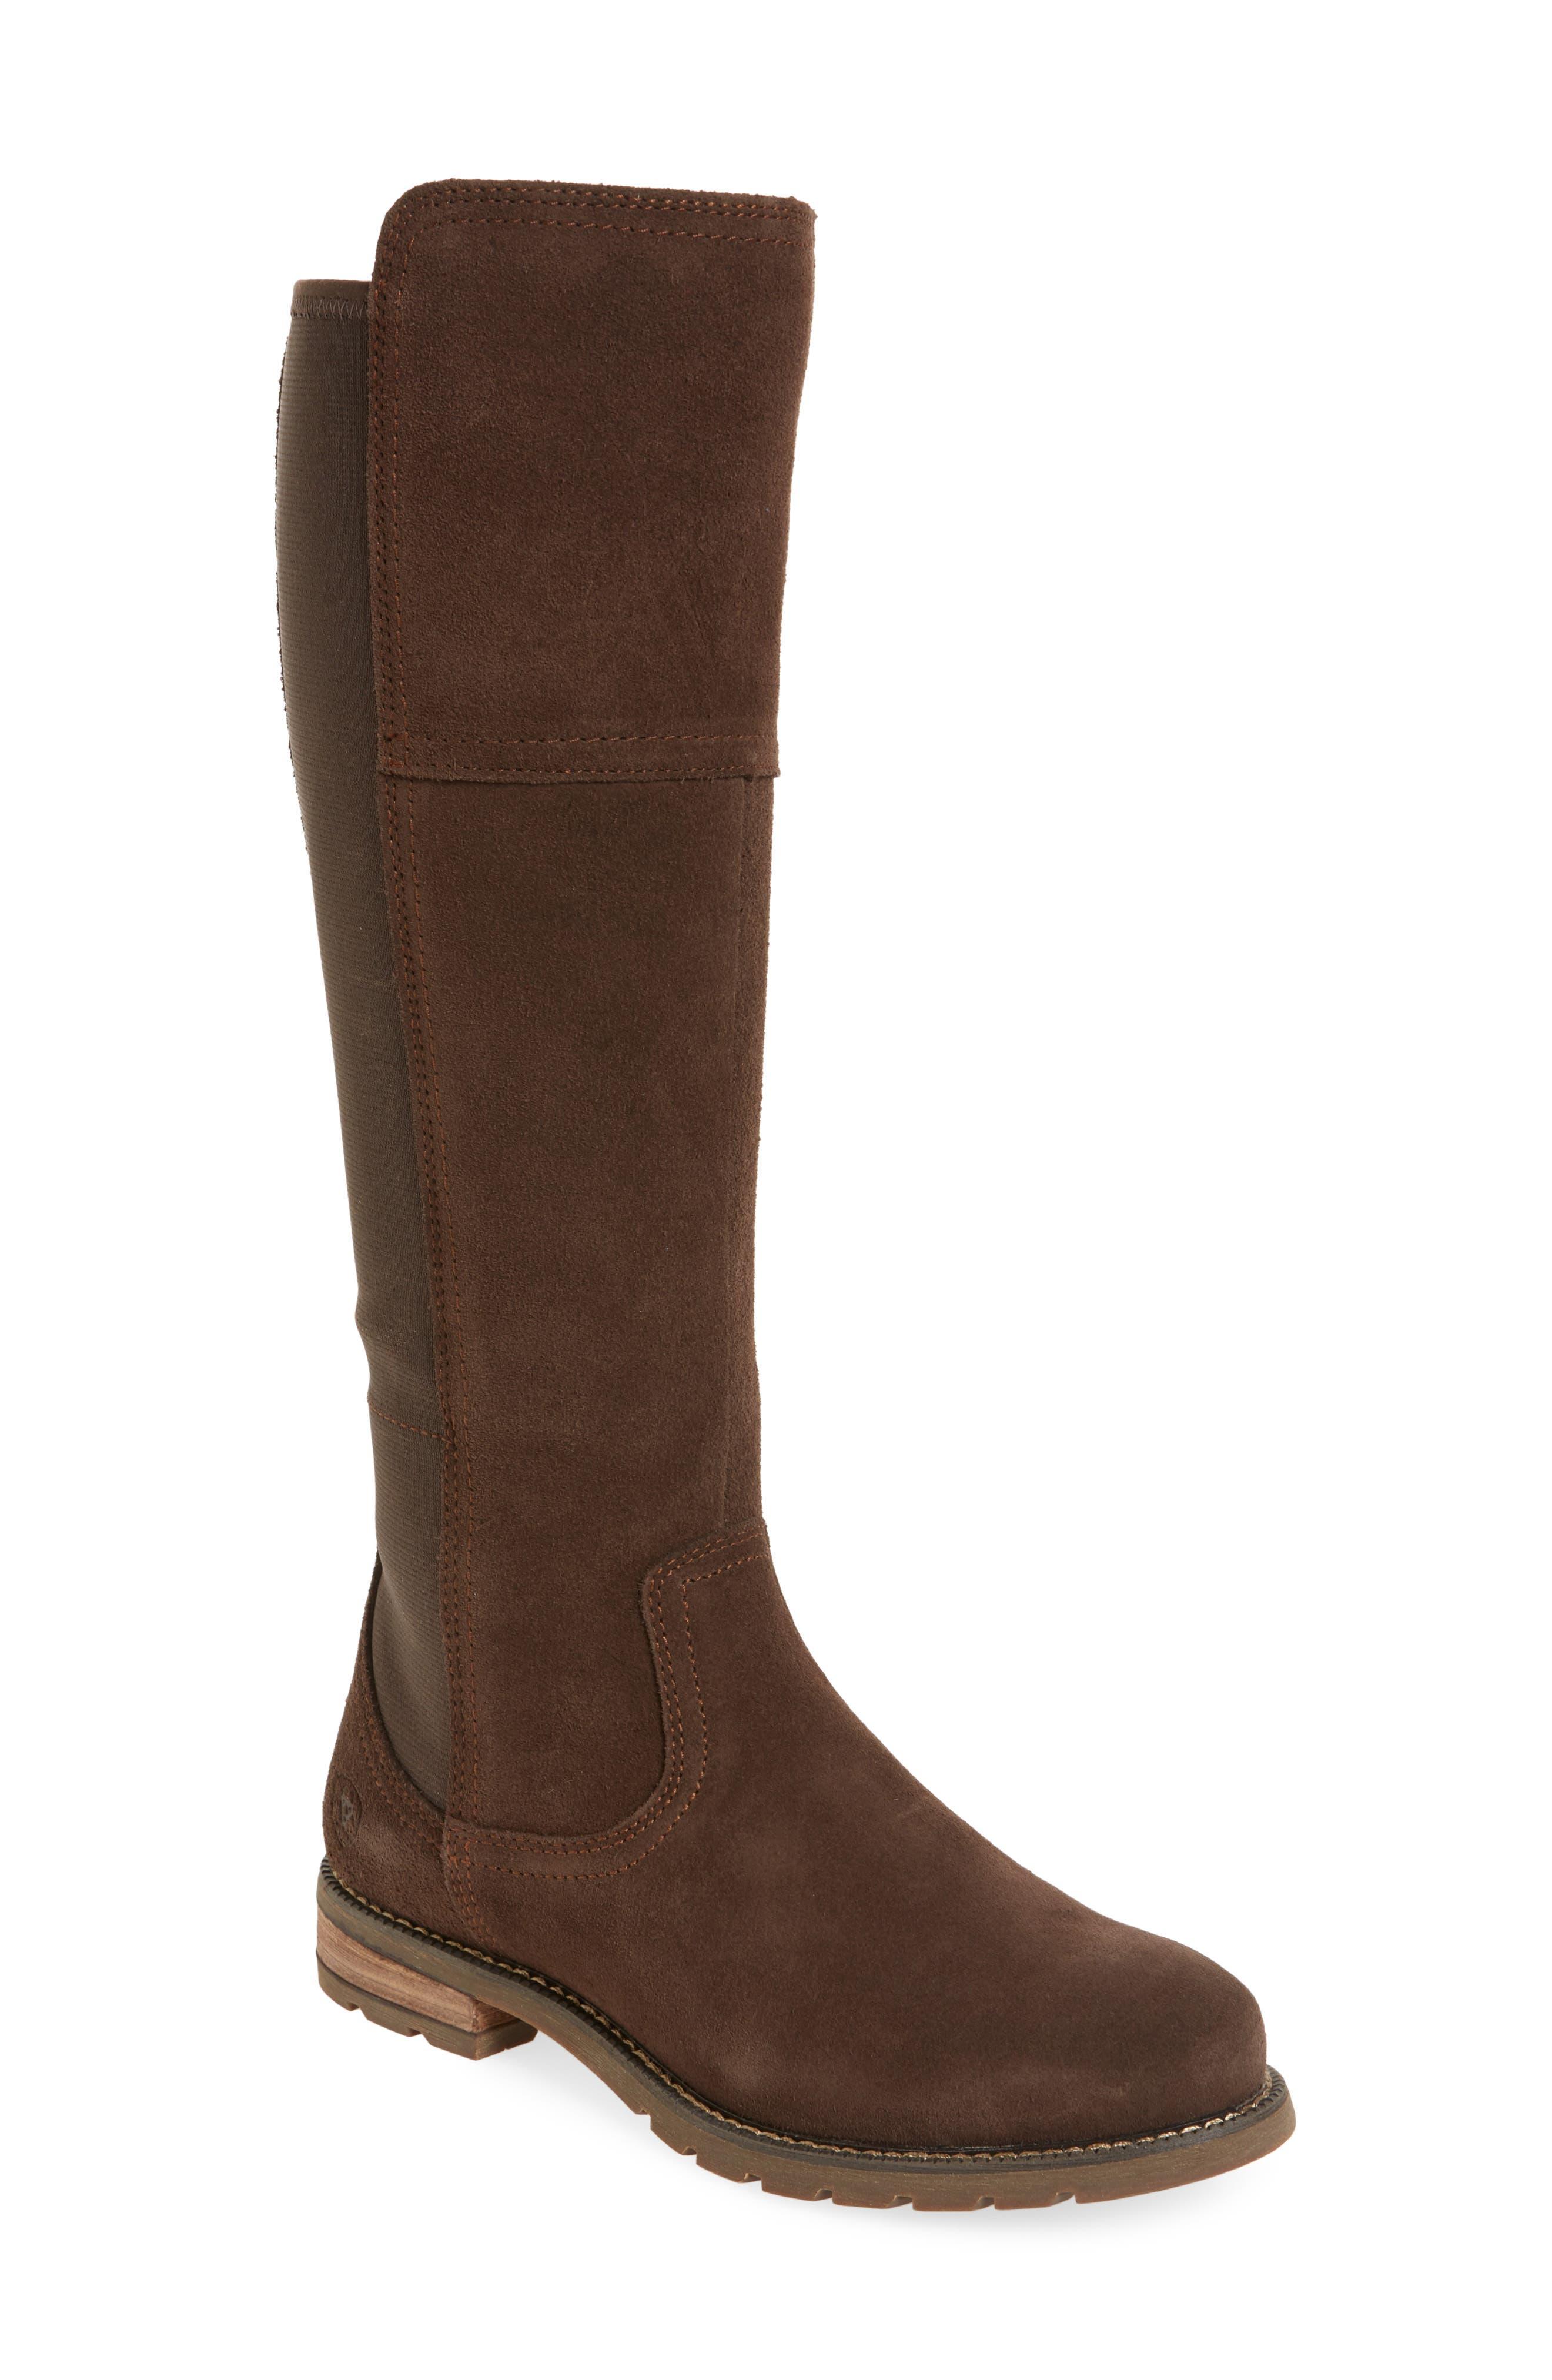 Ariat Sutton Waterproof Tall Boot- Brown